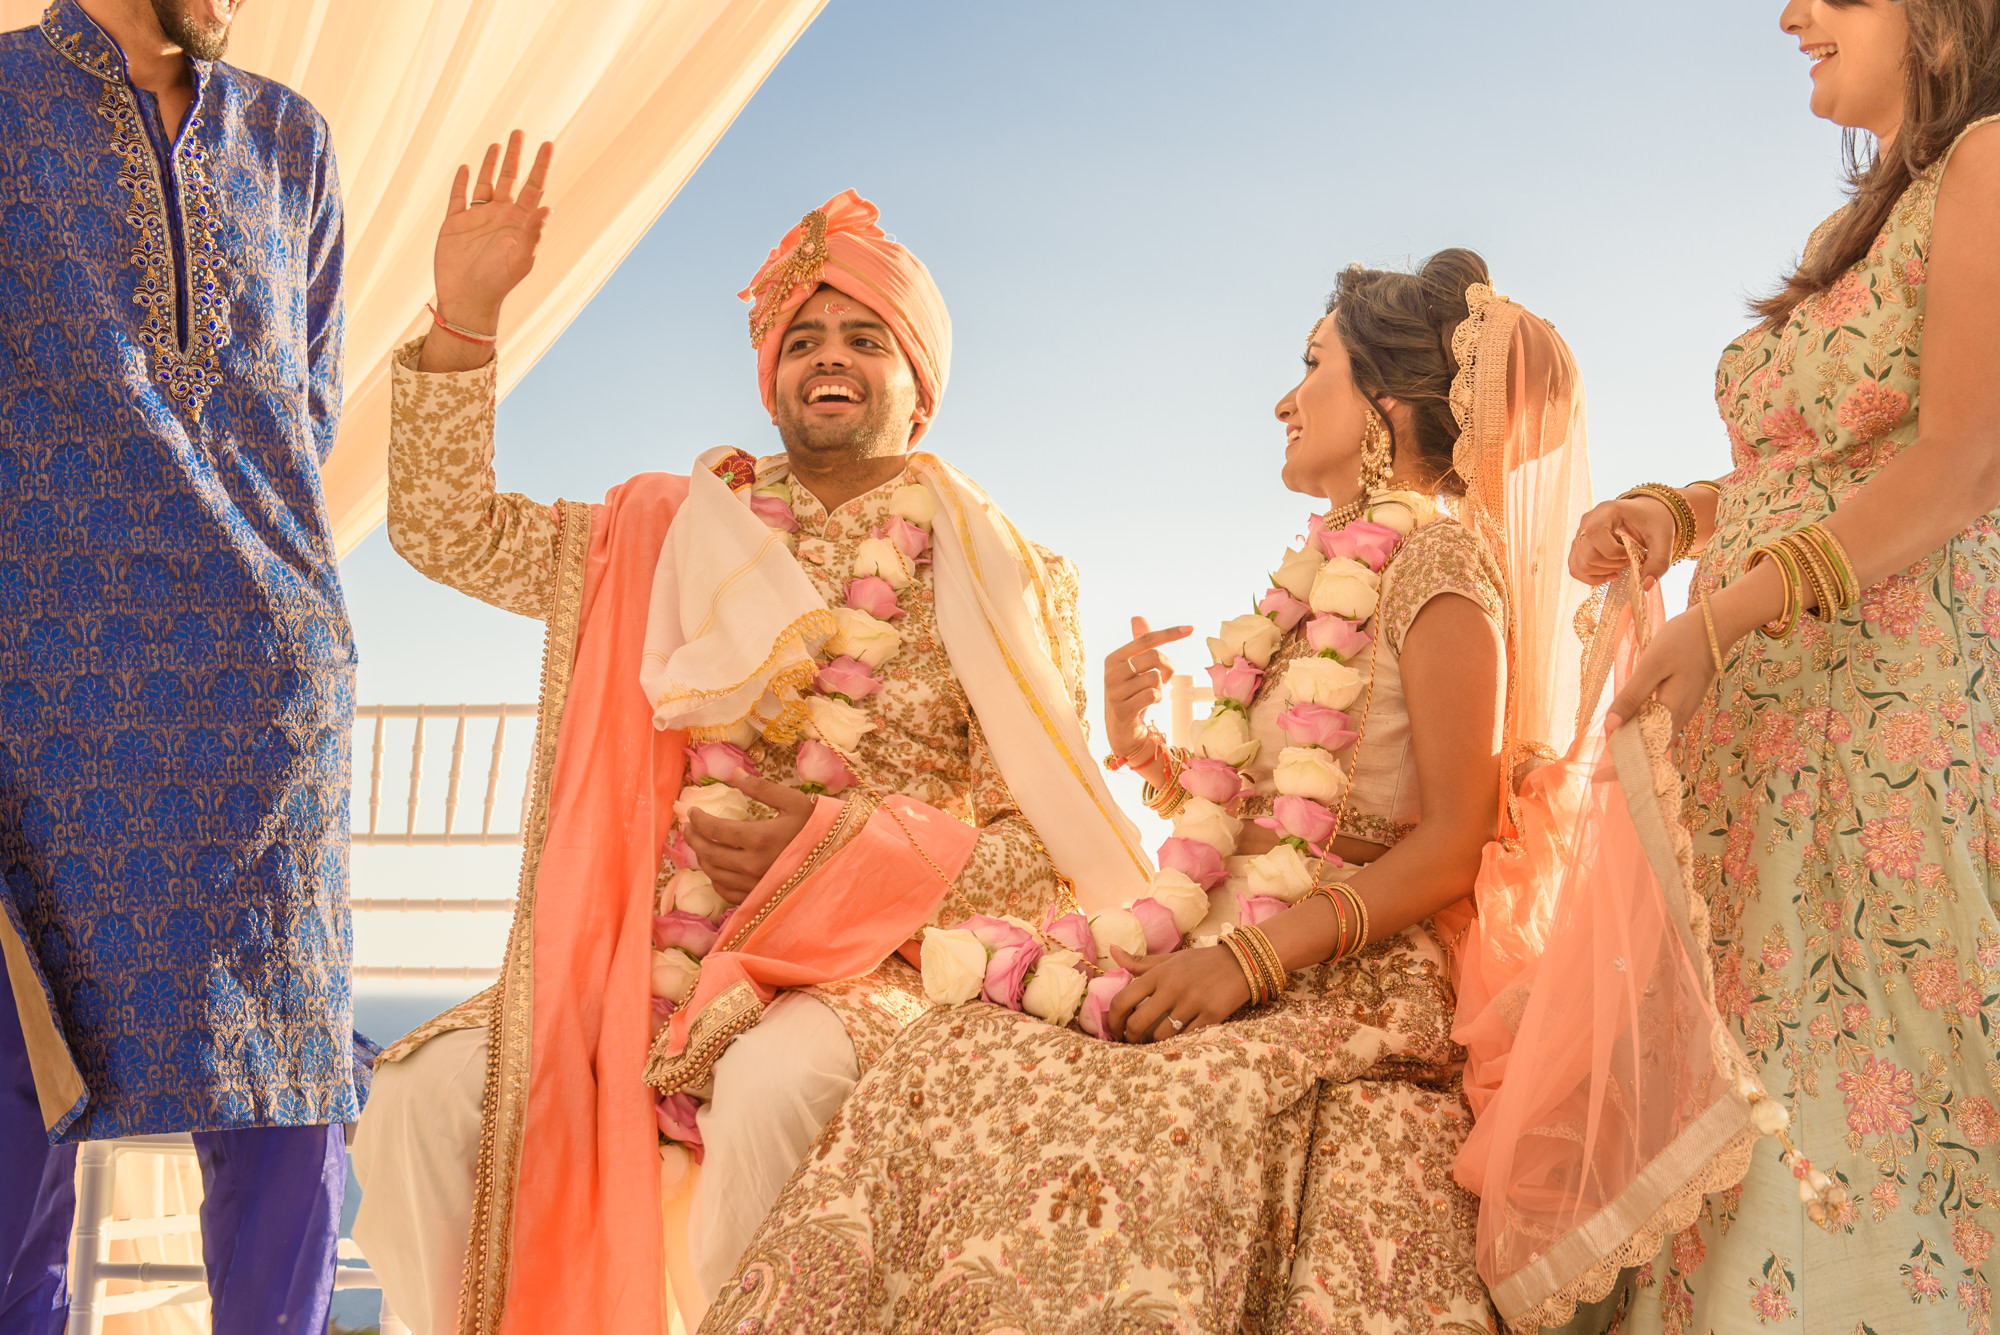 satnam photography wedding indian asian hindu destination wedding photographer tenerife ritz carlton abama-205.jpg